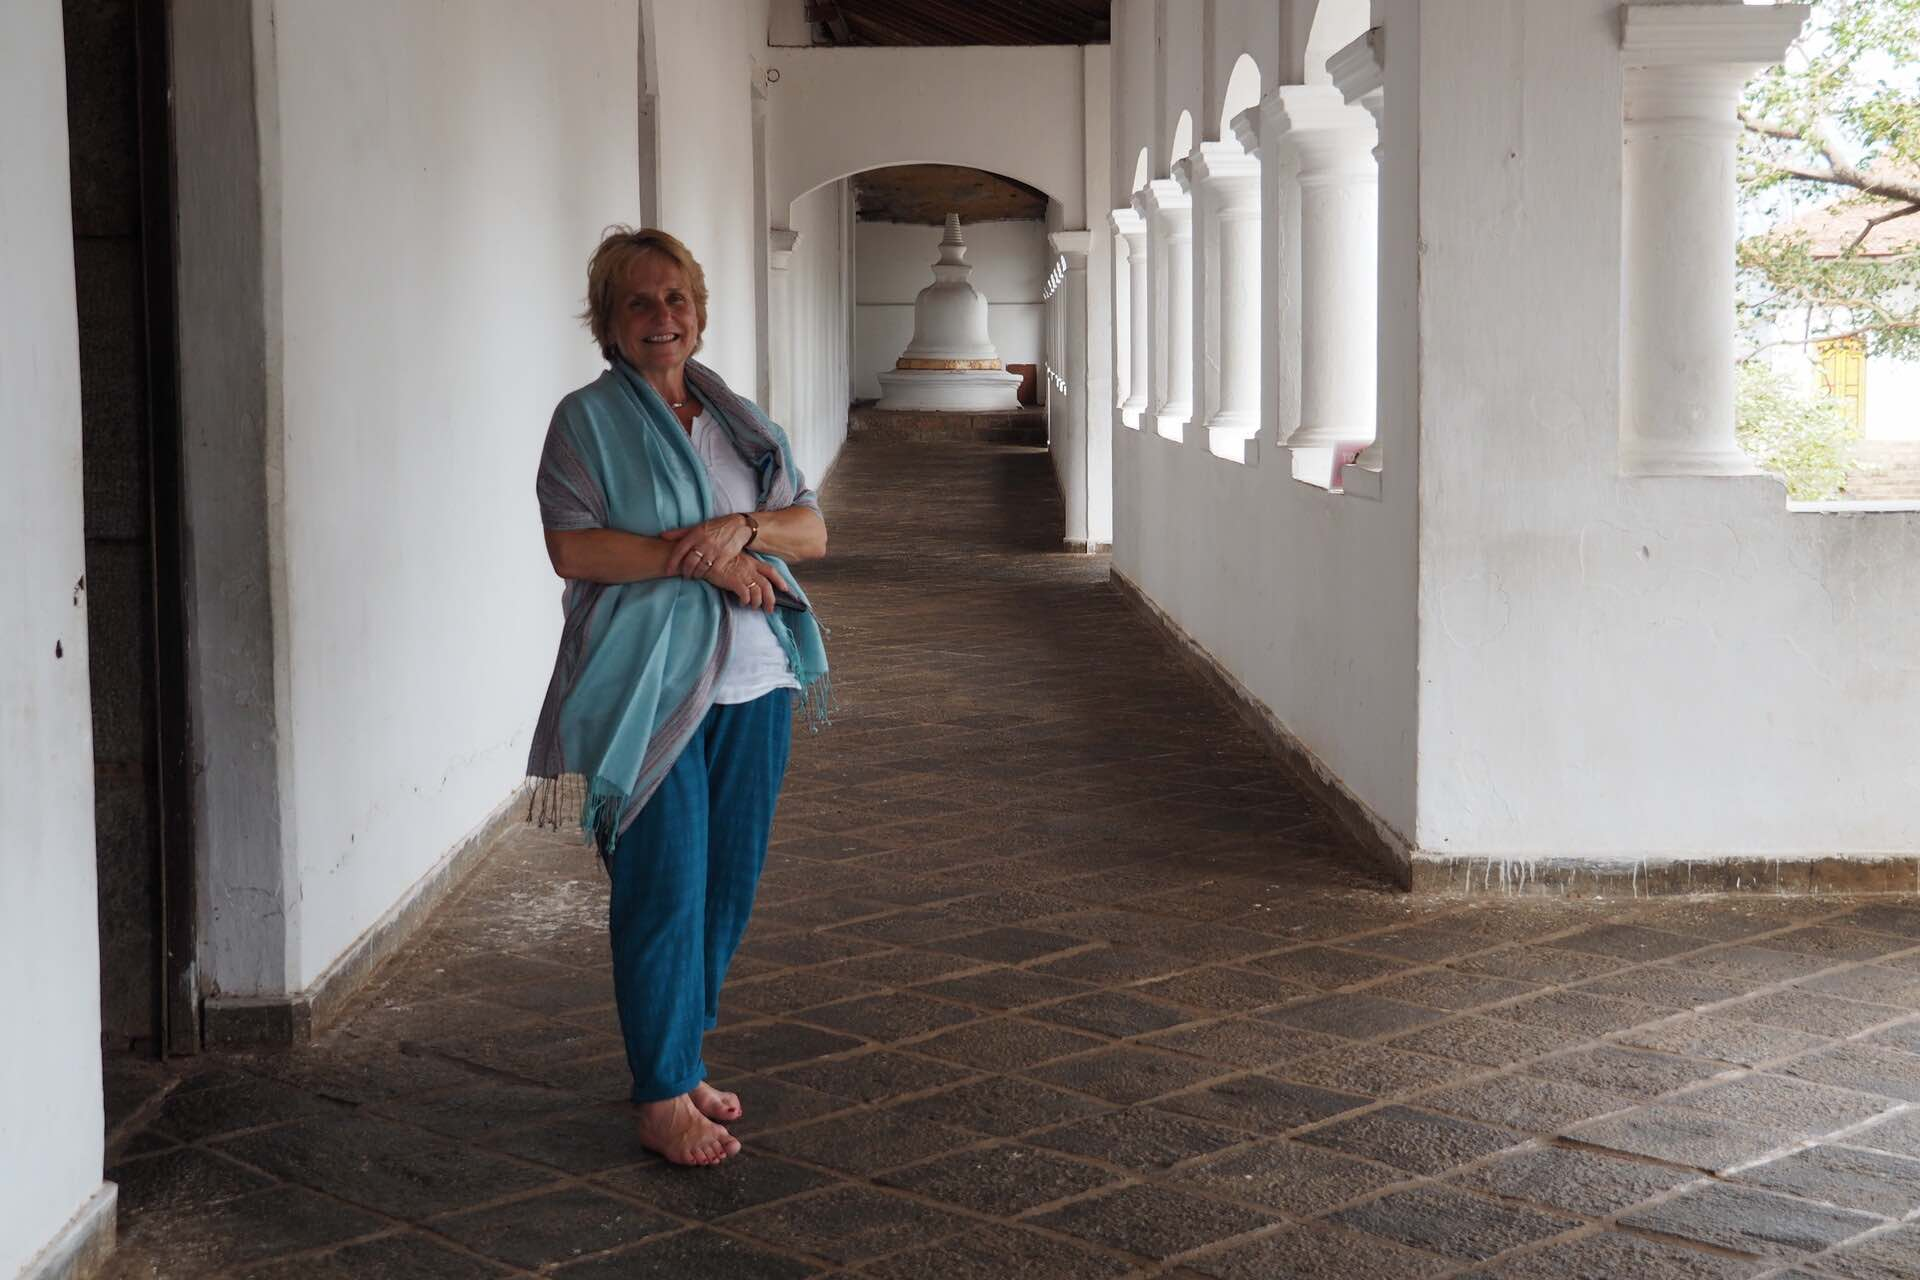 sri-lanka-dambulla-cave-temple-holiday-review-feedback-invite-to-paradise-quentin-kate-hulm.jpg